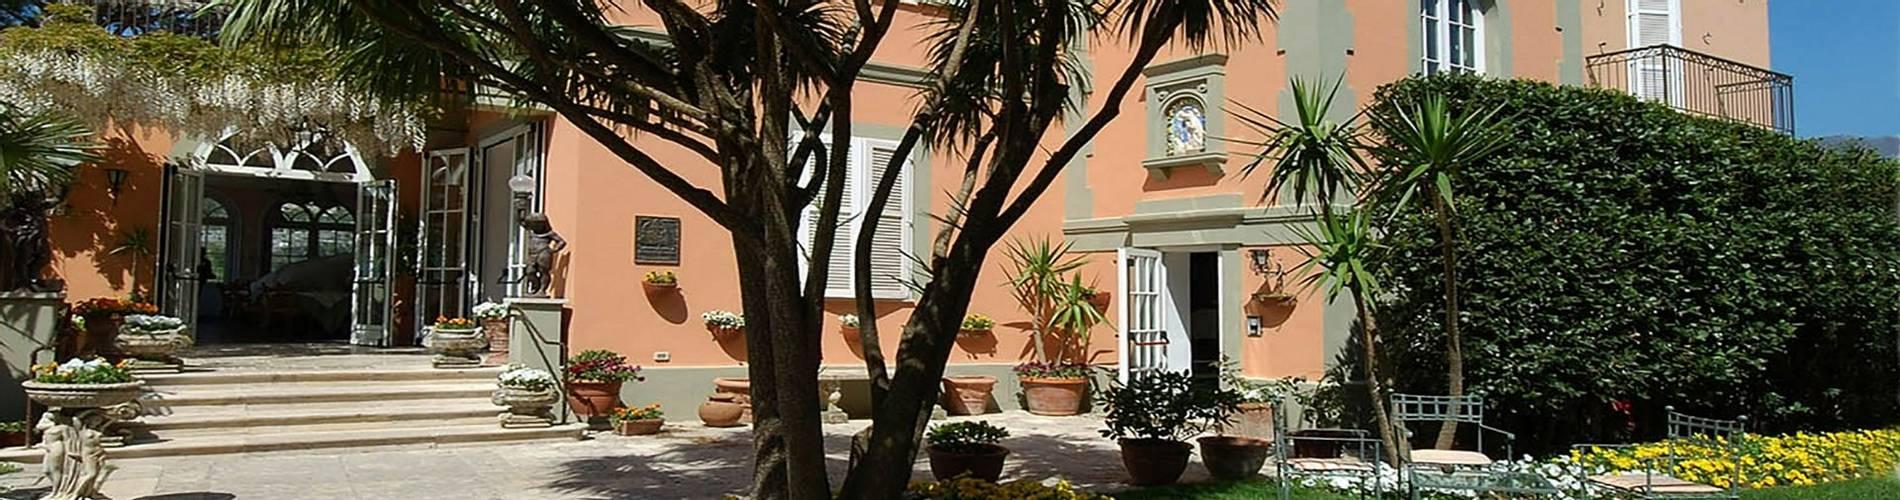 Villa Maria, Amalfi Coast, Italy (8).jpg